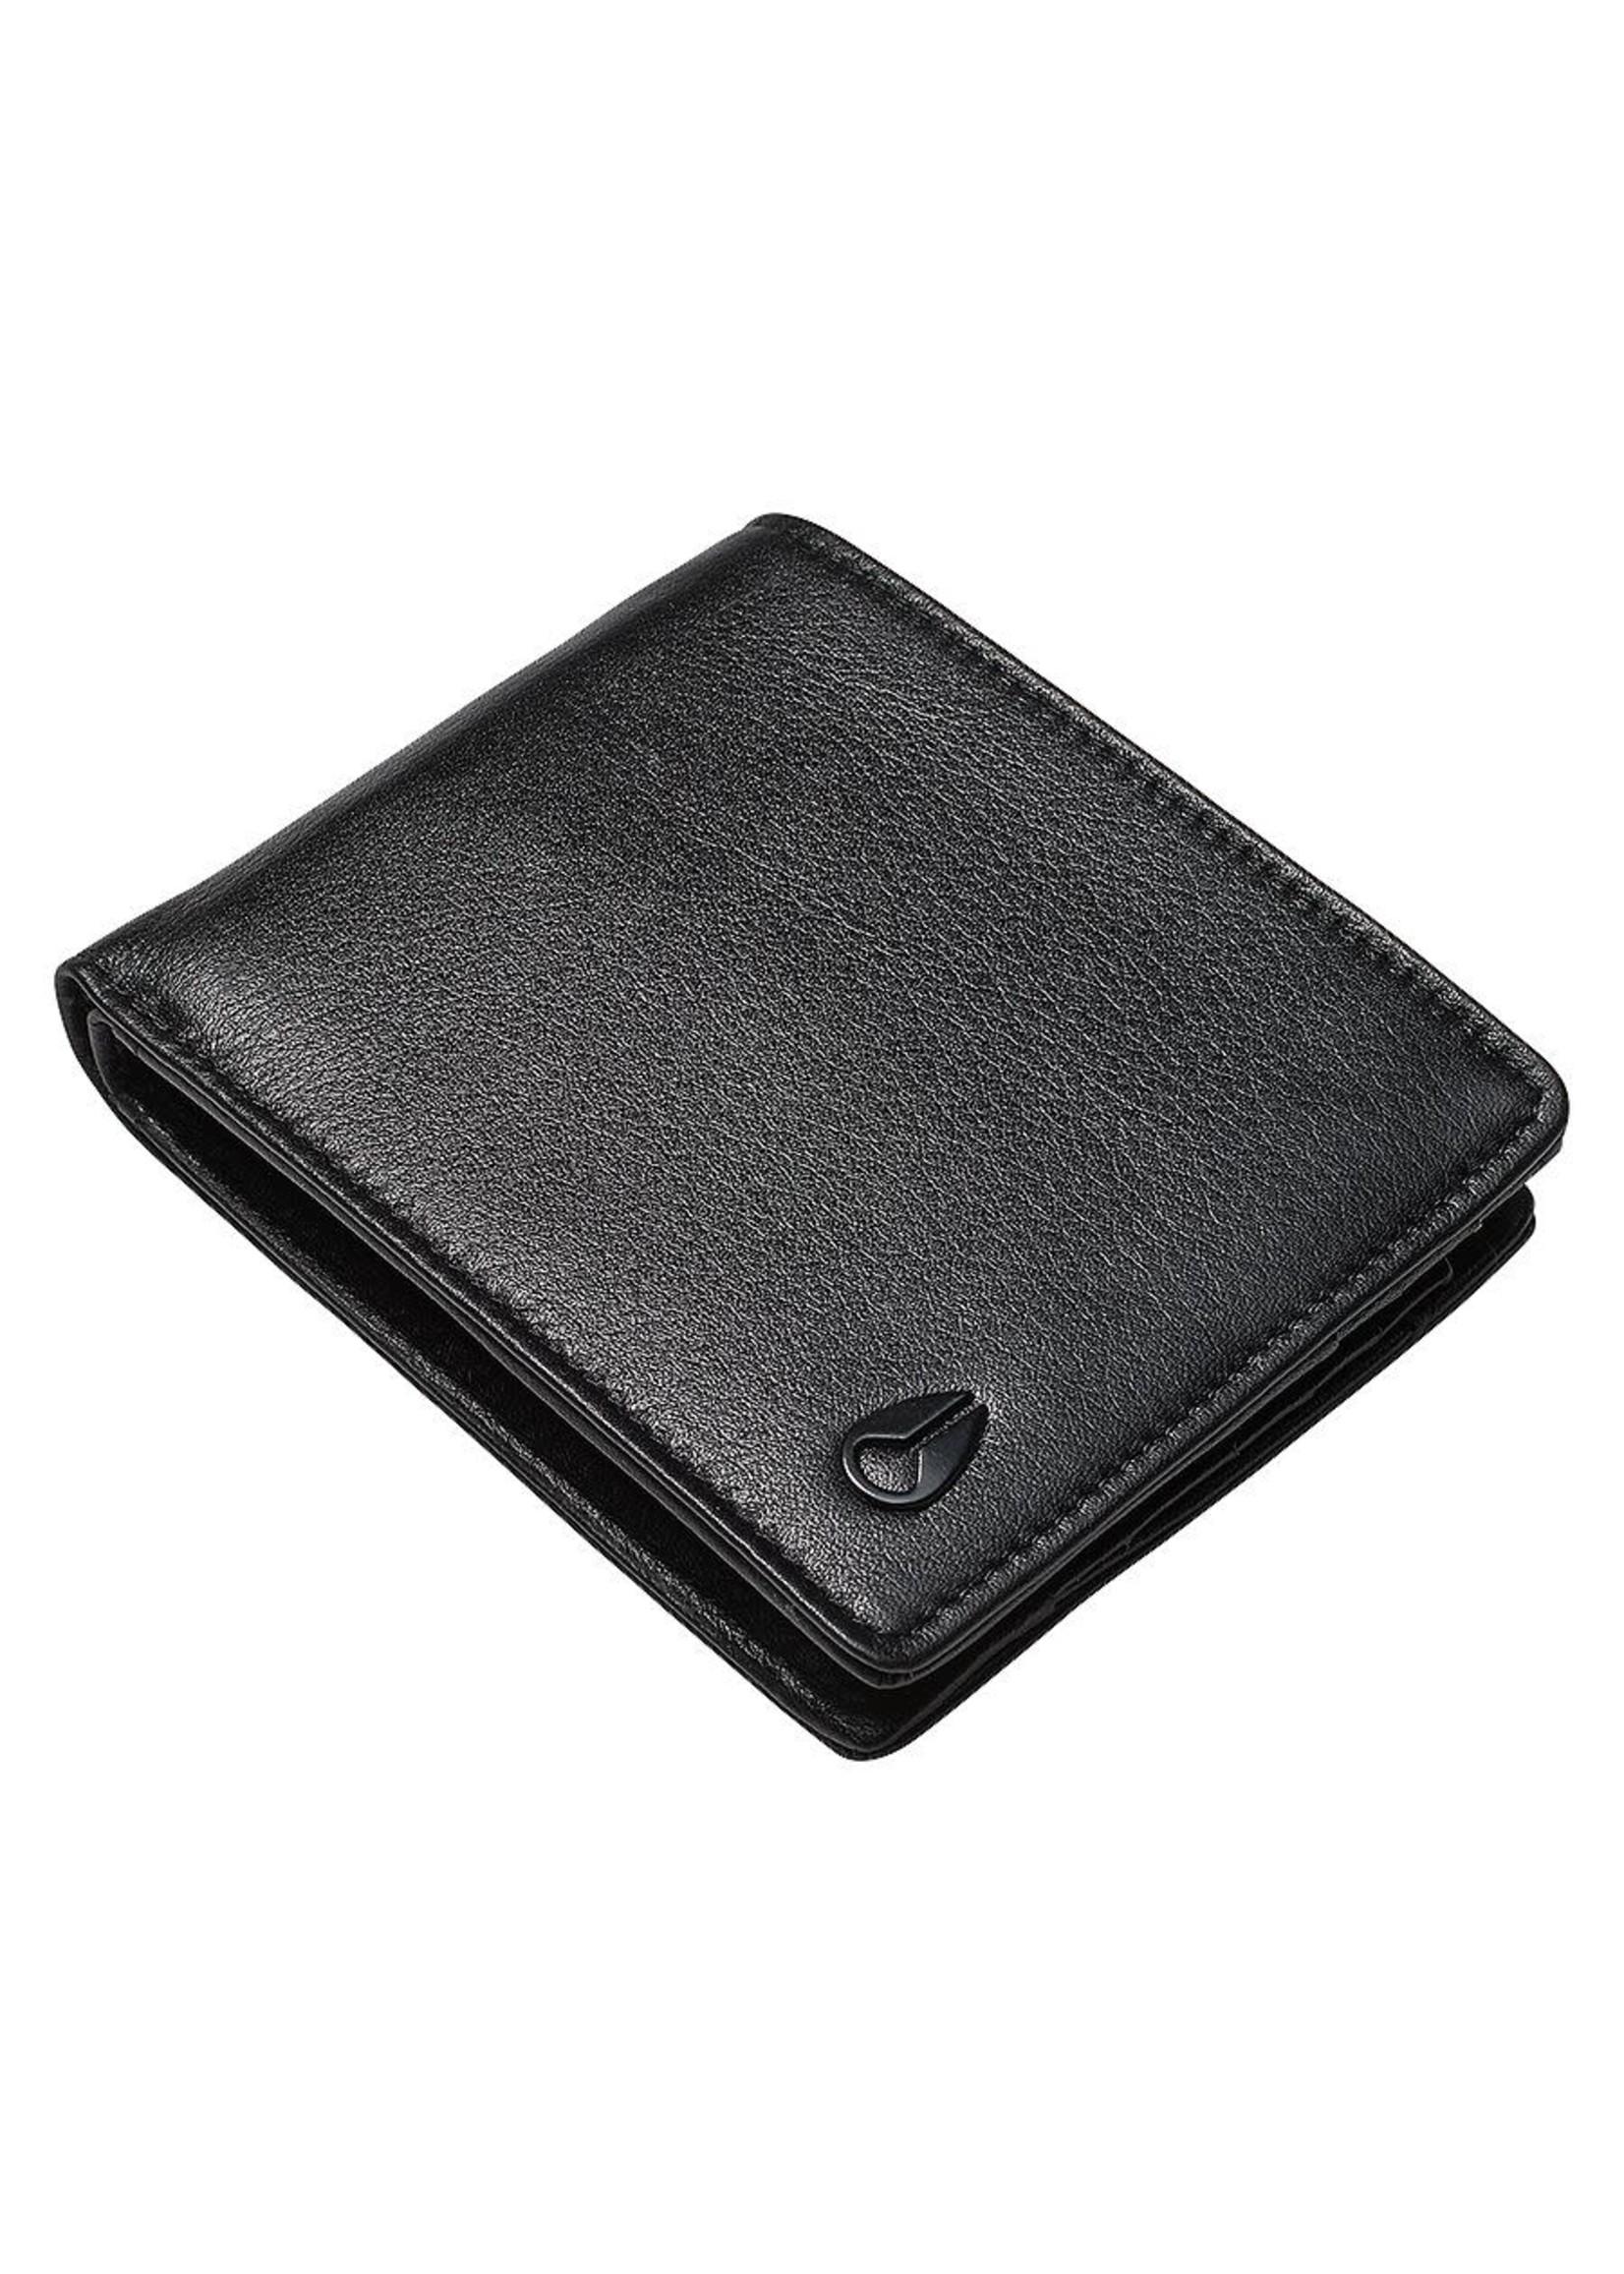 NIXON PASS leather Wallet, BLACK